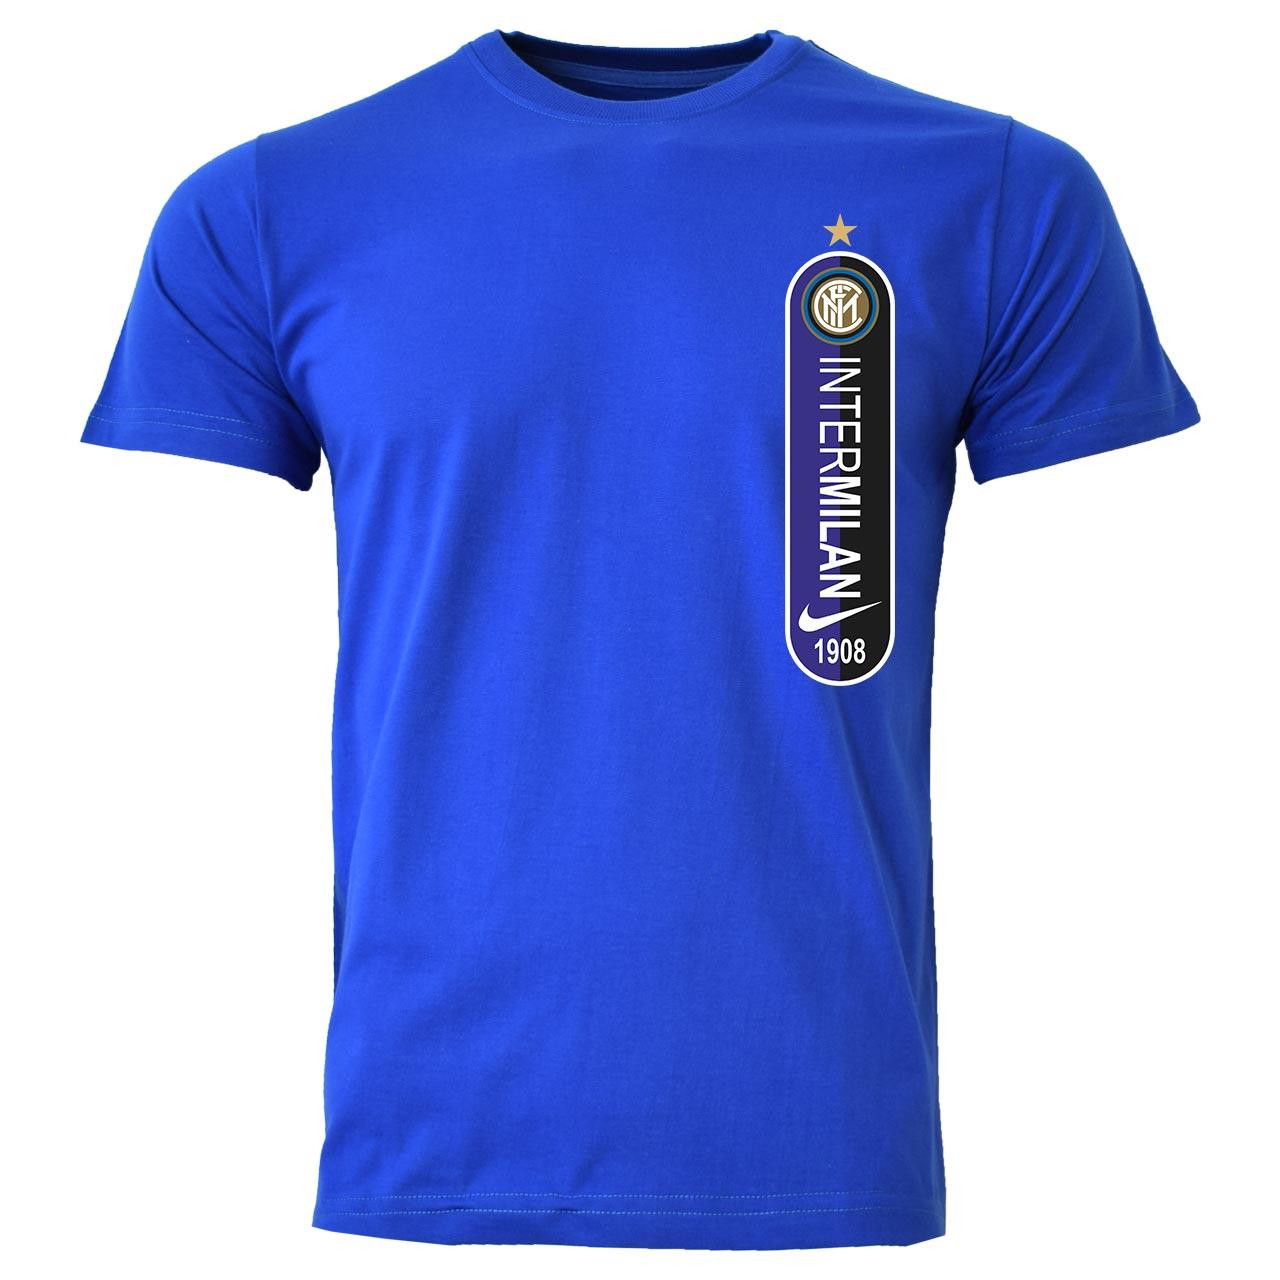 تیشرت مردانه طرح اینترمیلان کد A04 رنگ آبی